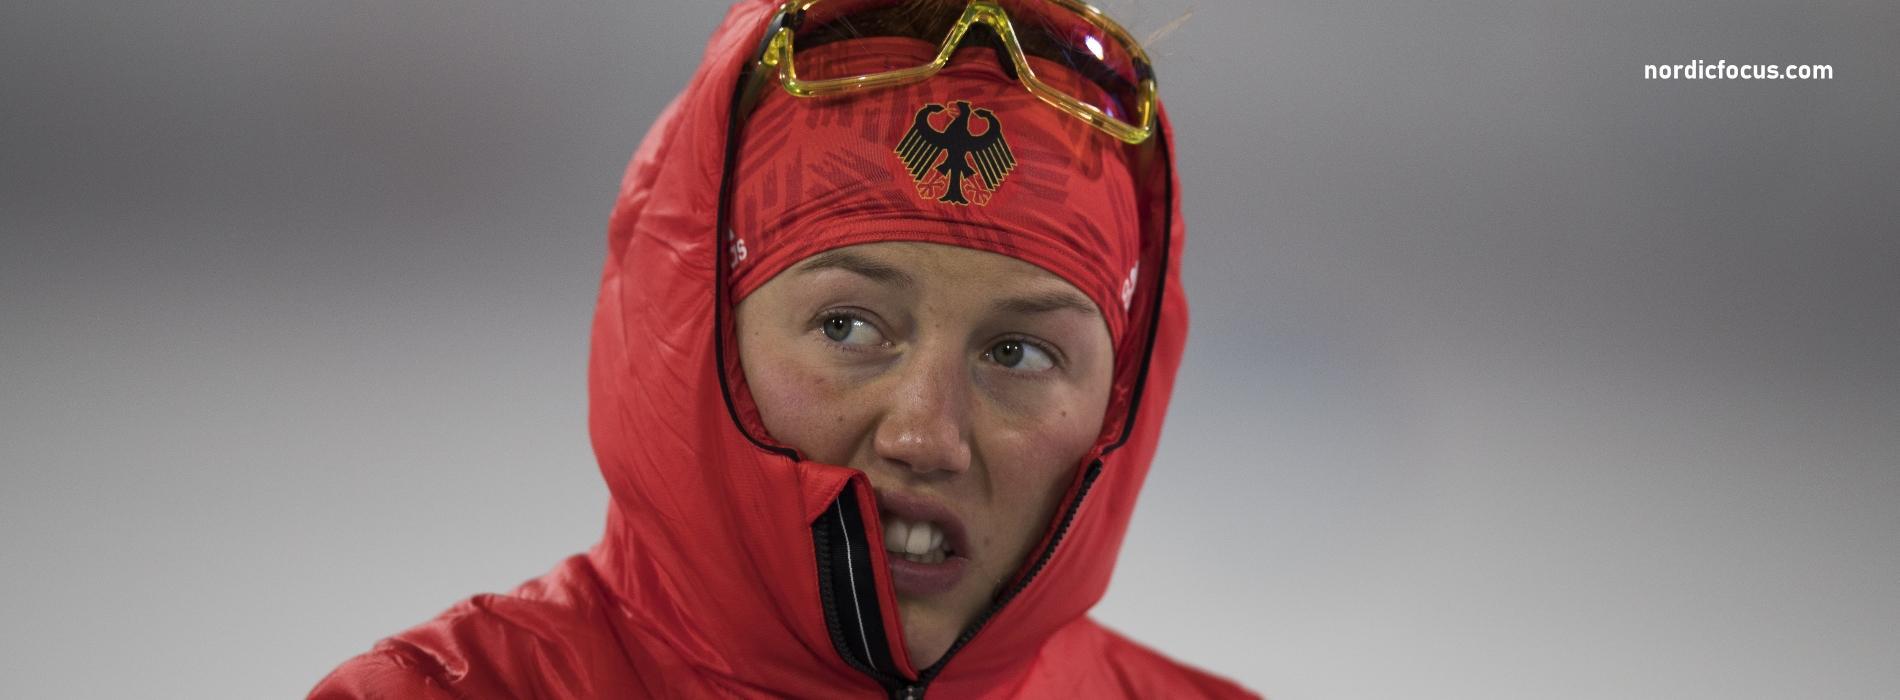 Laura Dahlmeier PyeongChang 2018 Sprint